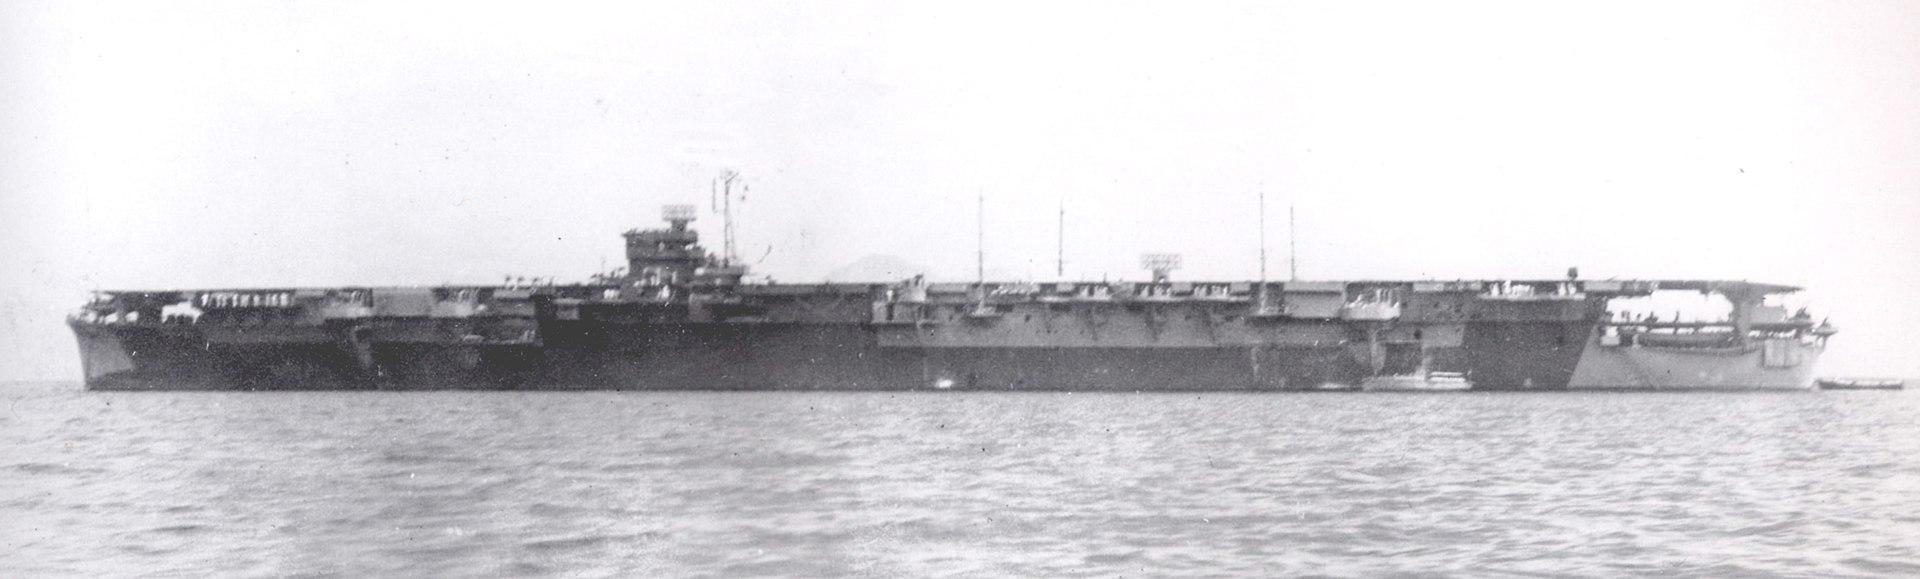 Warship - Amagi - Carrier